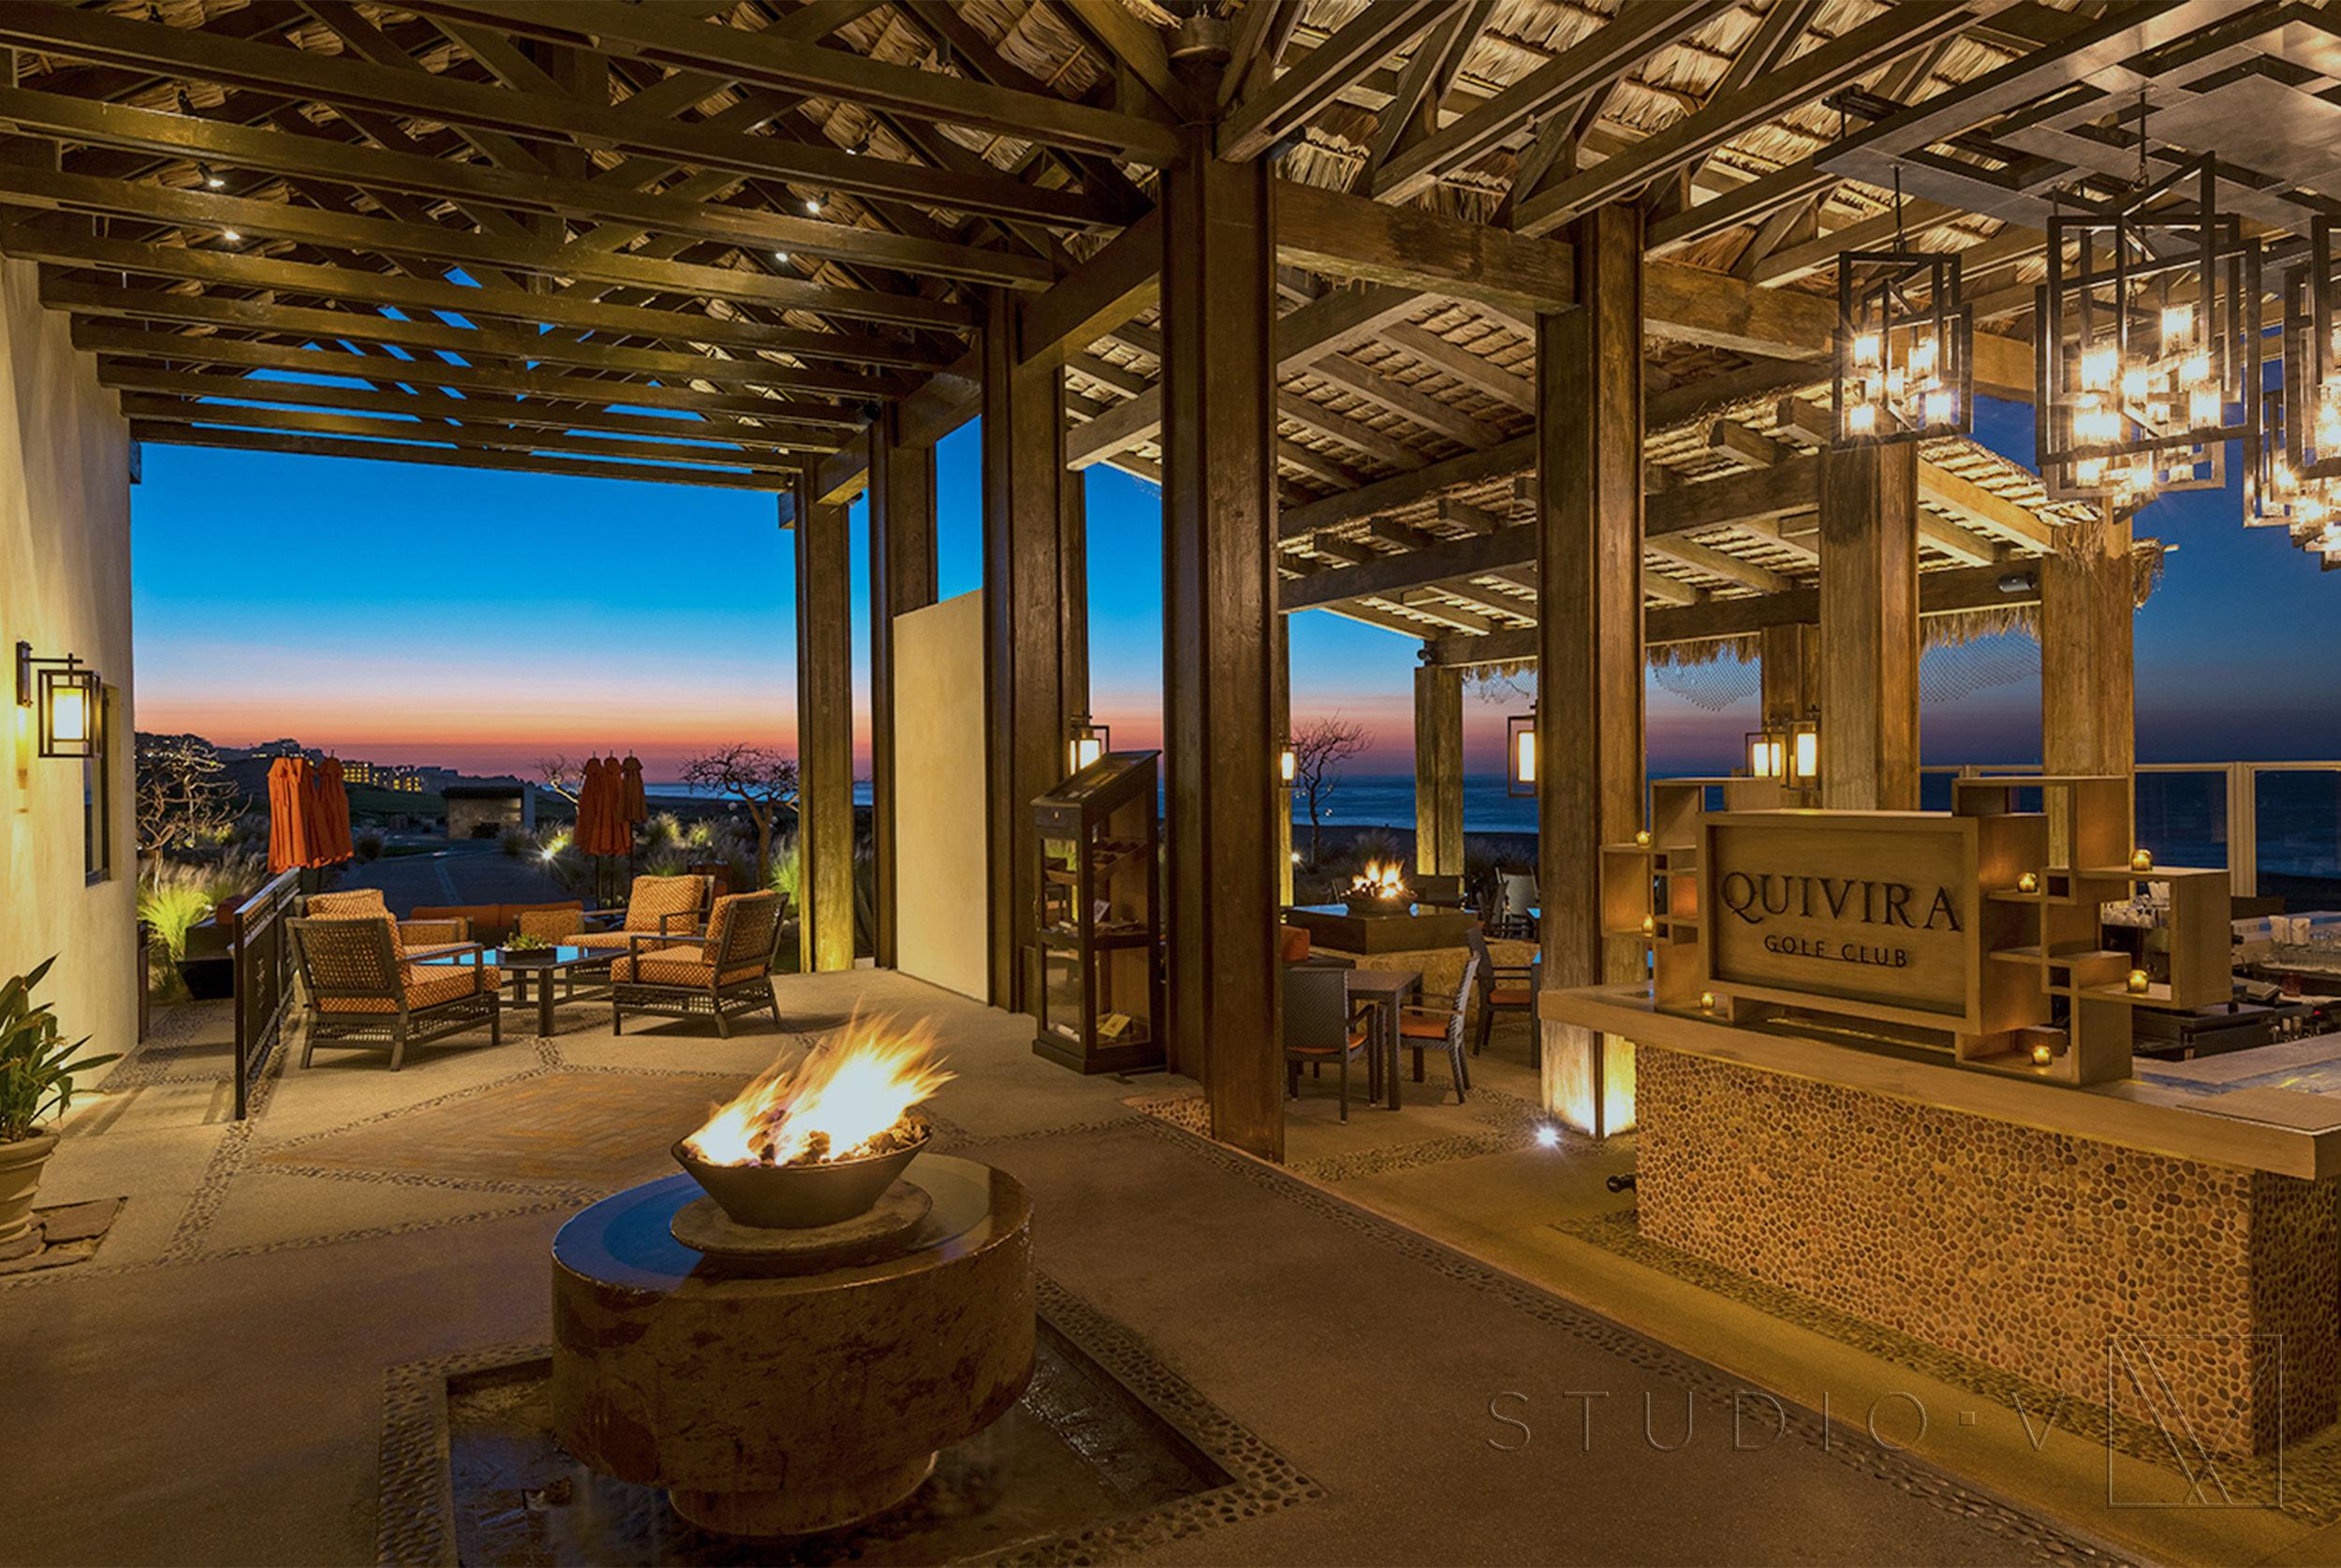 Quivira Clubhouse Sunset Beach Cabo San Lucas Studio V Interior Architecture and Design Scottsdale Arizona AZ (4).jpg